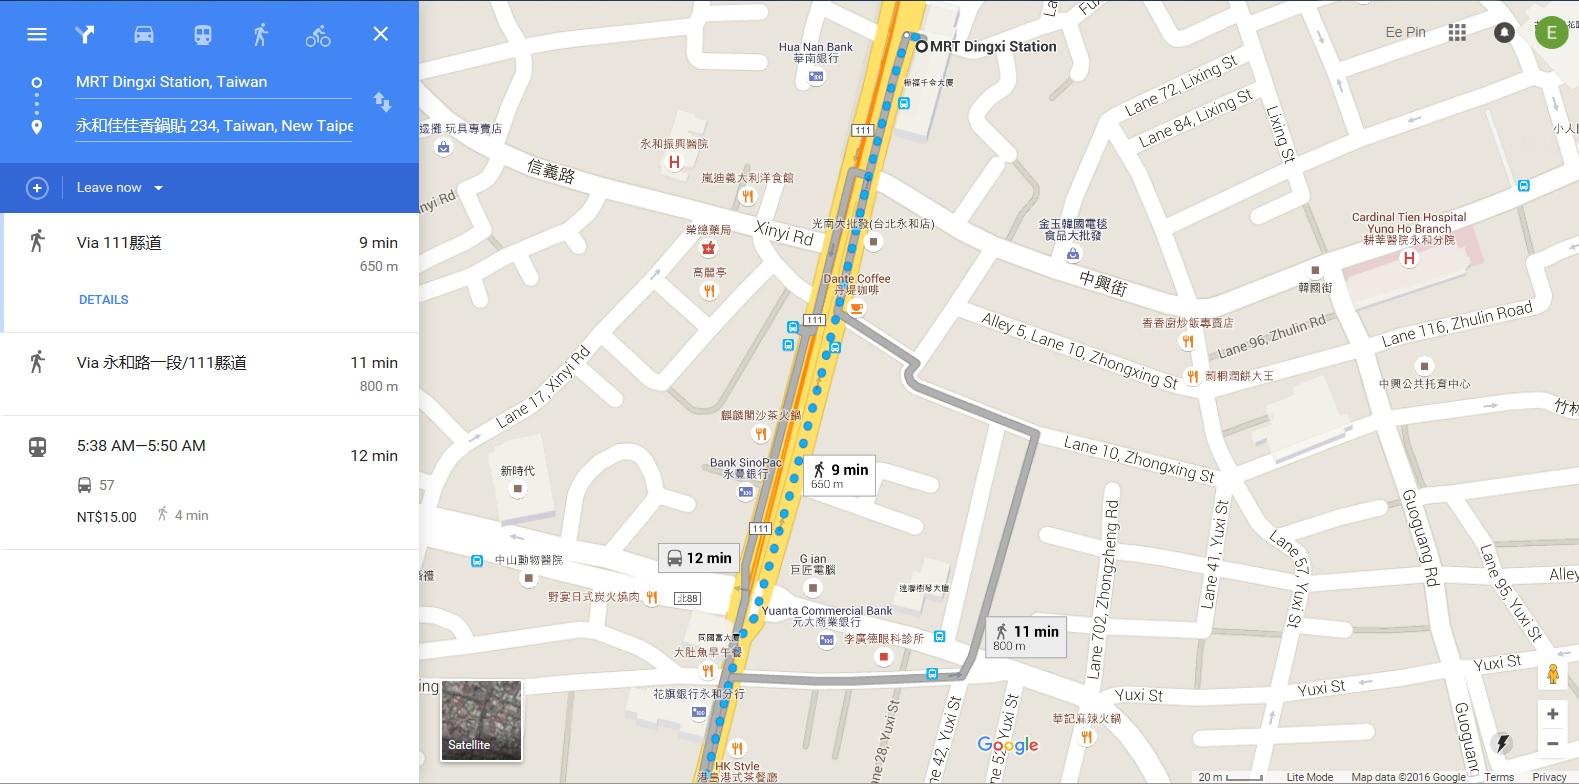 [TAIPEI 台北] Day 8: Dingxi food:World Soybean Milk Magnate, Jia Jia Fried Dumpling 第八天:顶溪站美食:世界豆浆大王,佳佳香锅贴